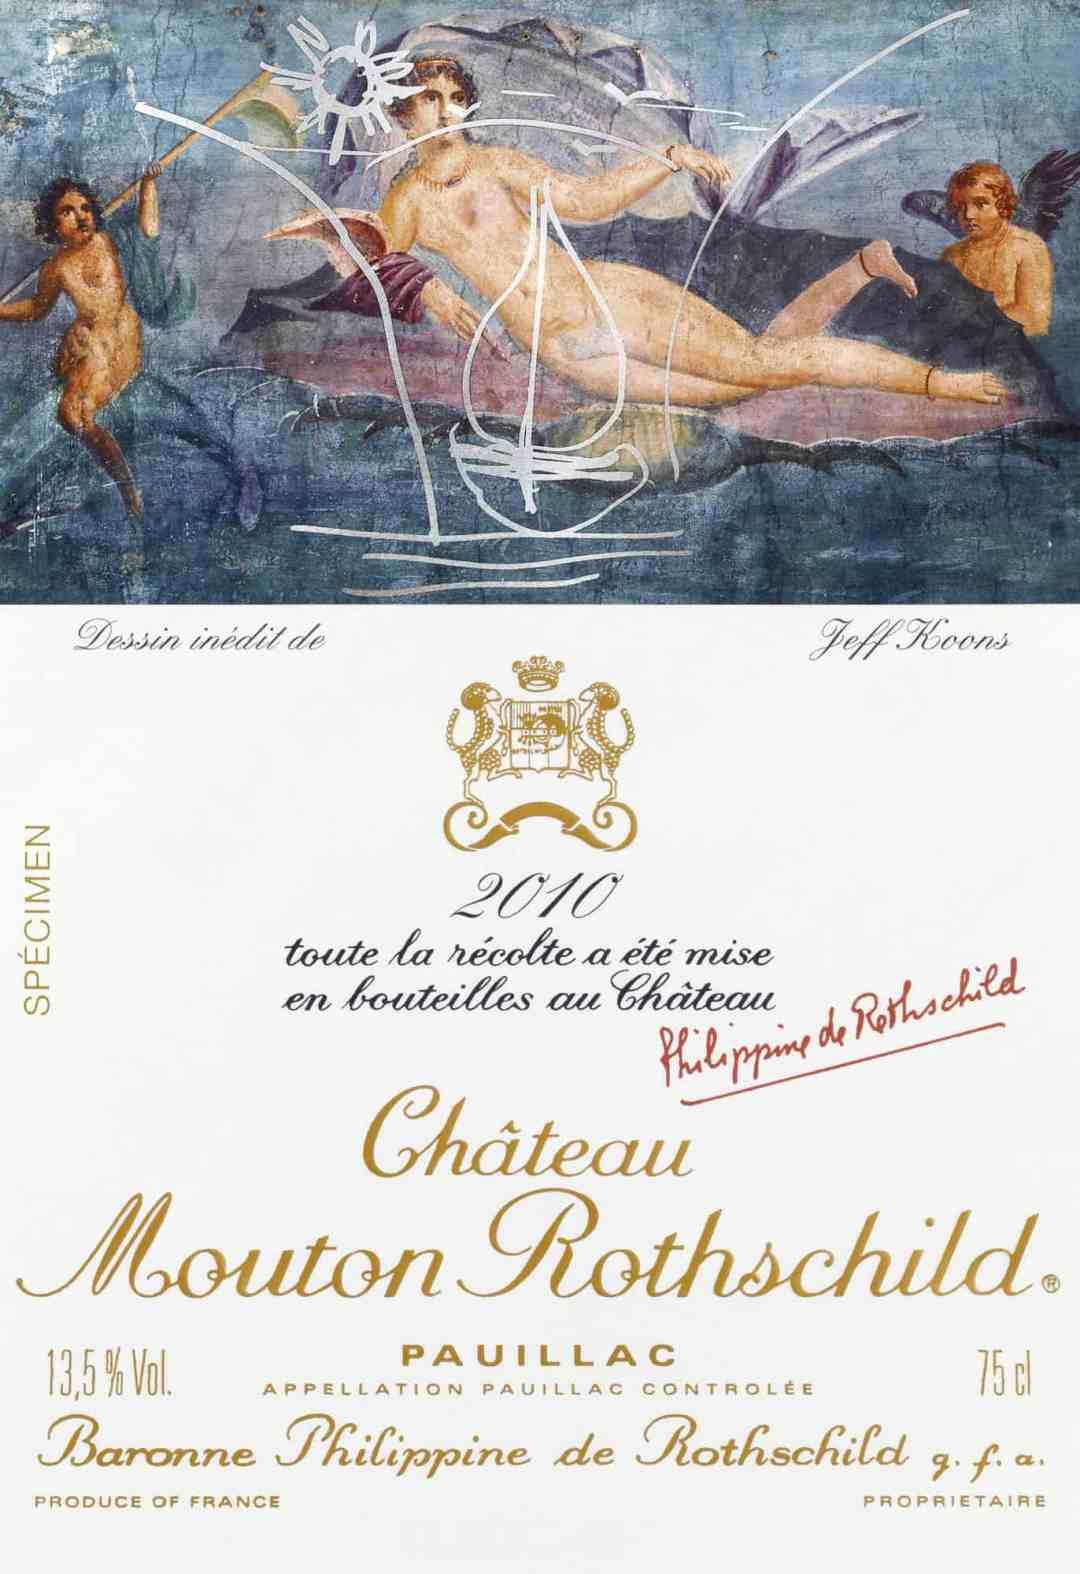 Etiquette designed by Jeff Koons, Château Mouton Rothschild